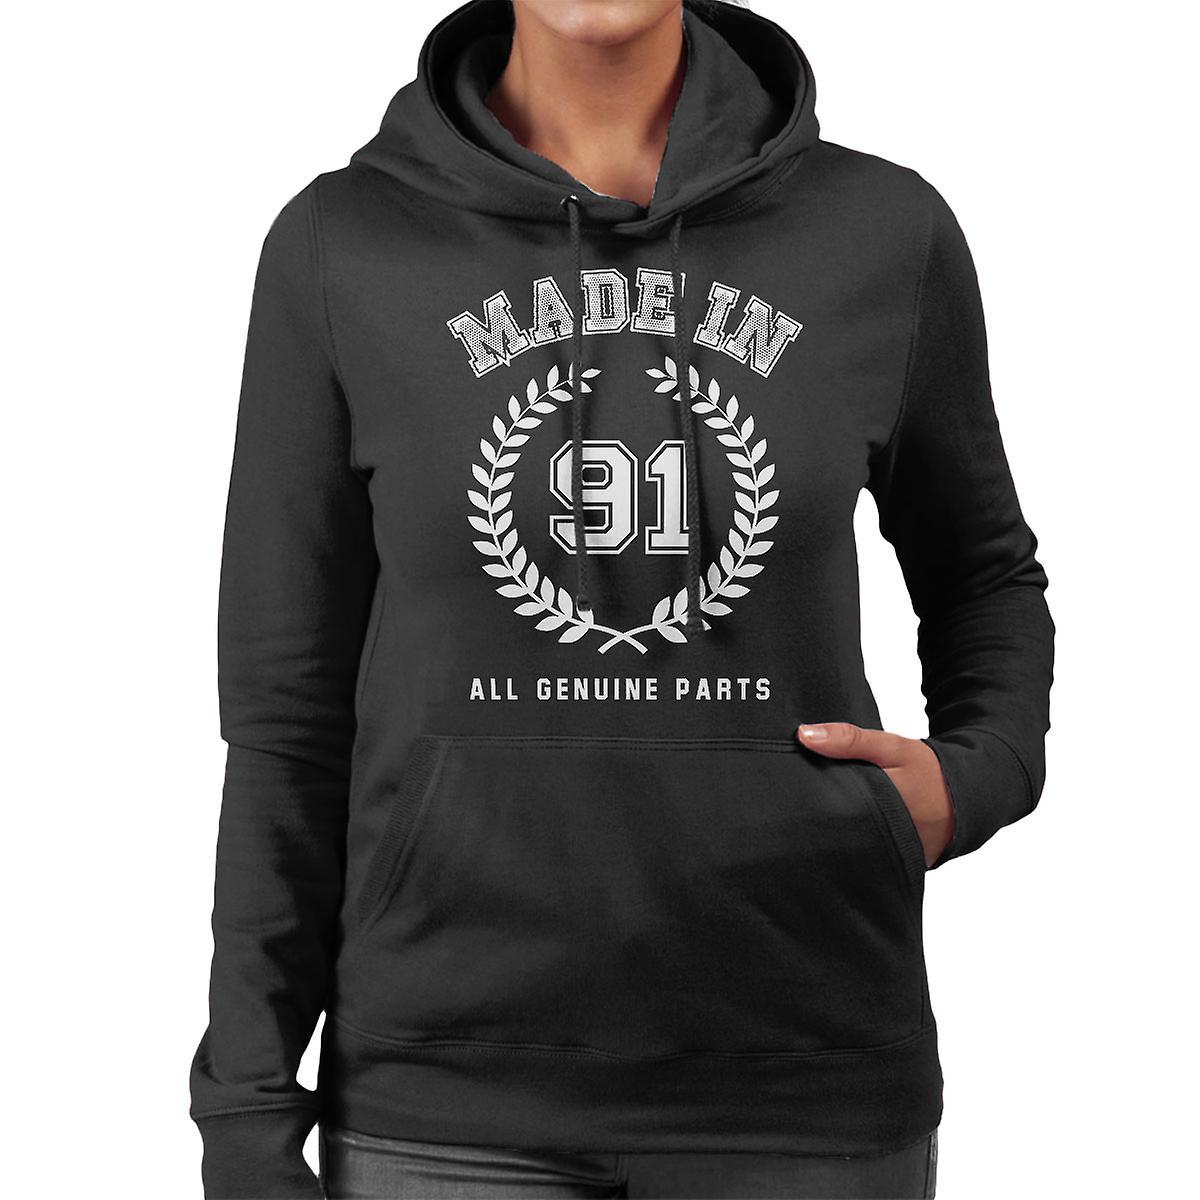 Made In 91 Hooded Sweatshirt di tutte le parti originali donne